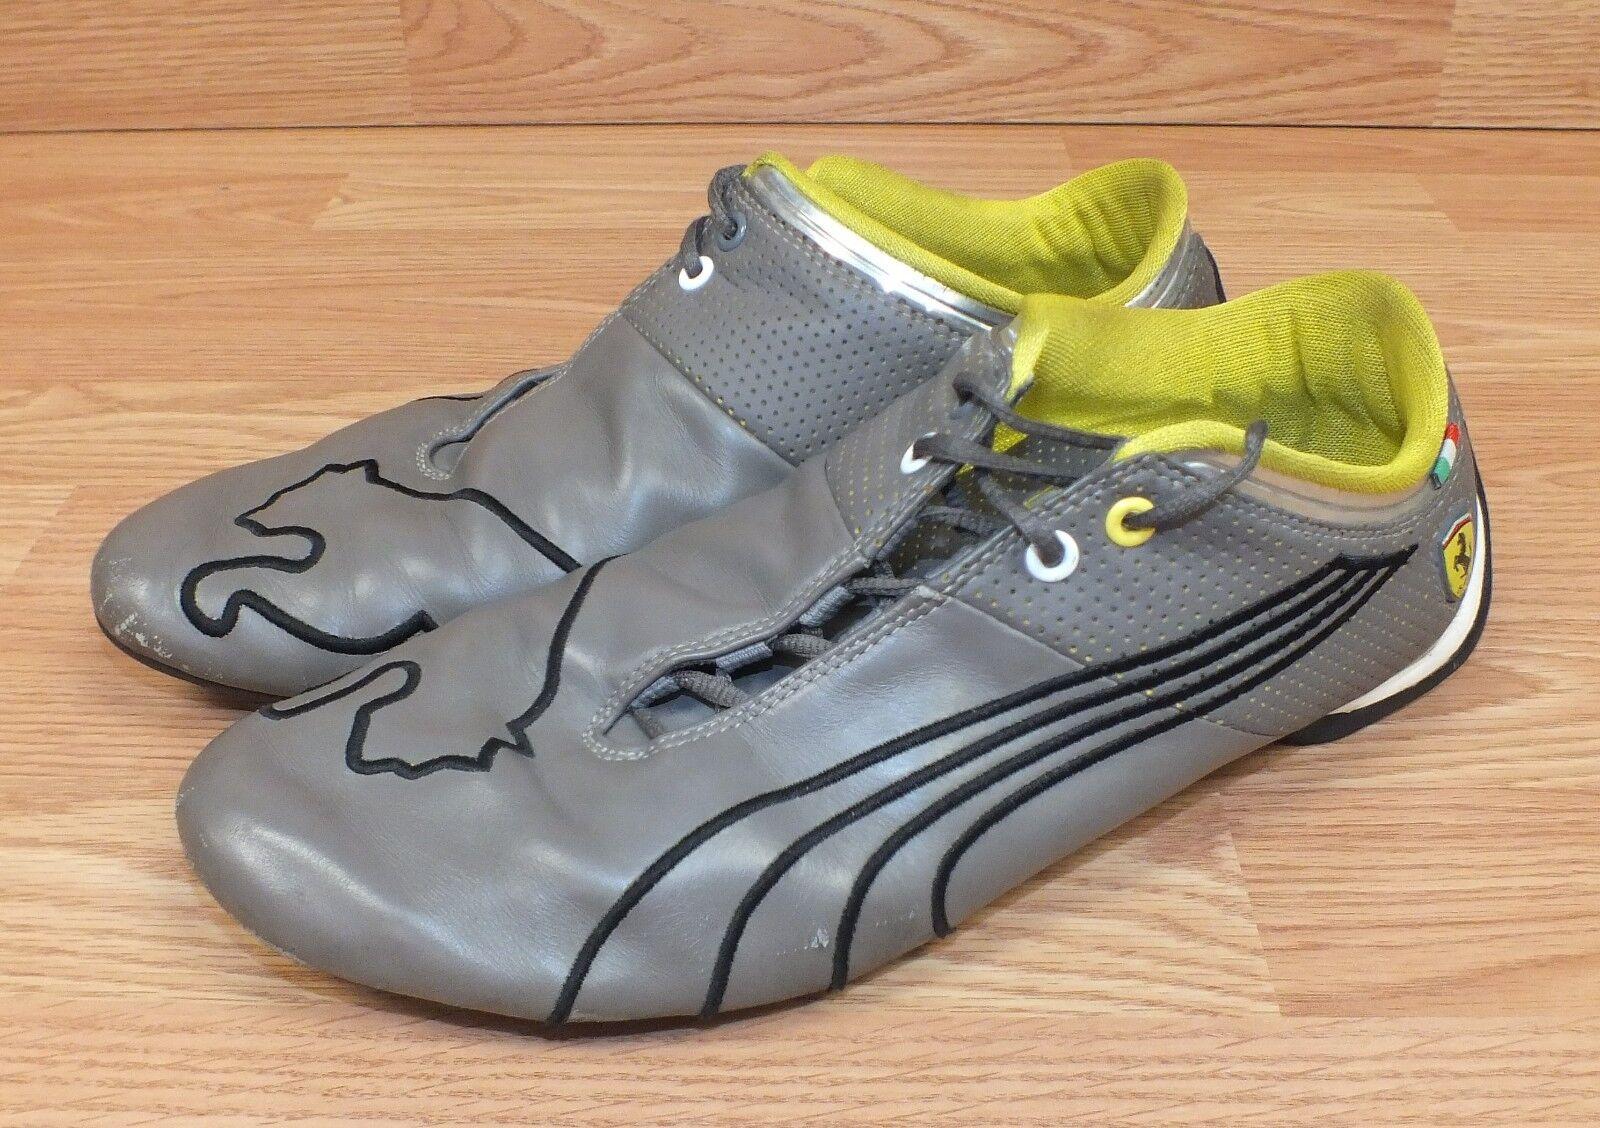 Puma (887119628055) Ferrari Sport Lifestyle Eco Ortho Lite Size 11.5 US shoes